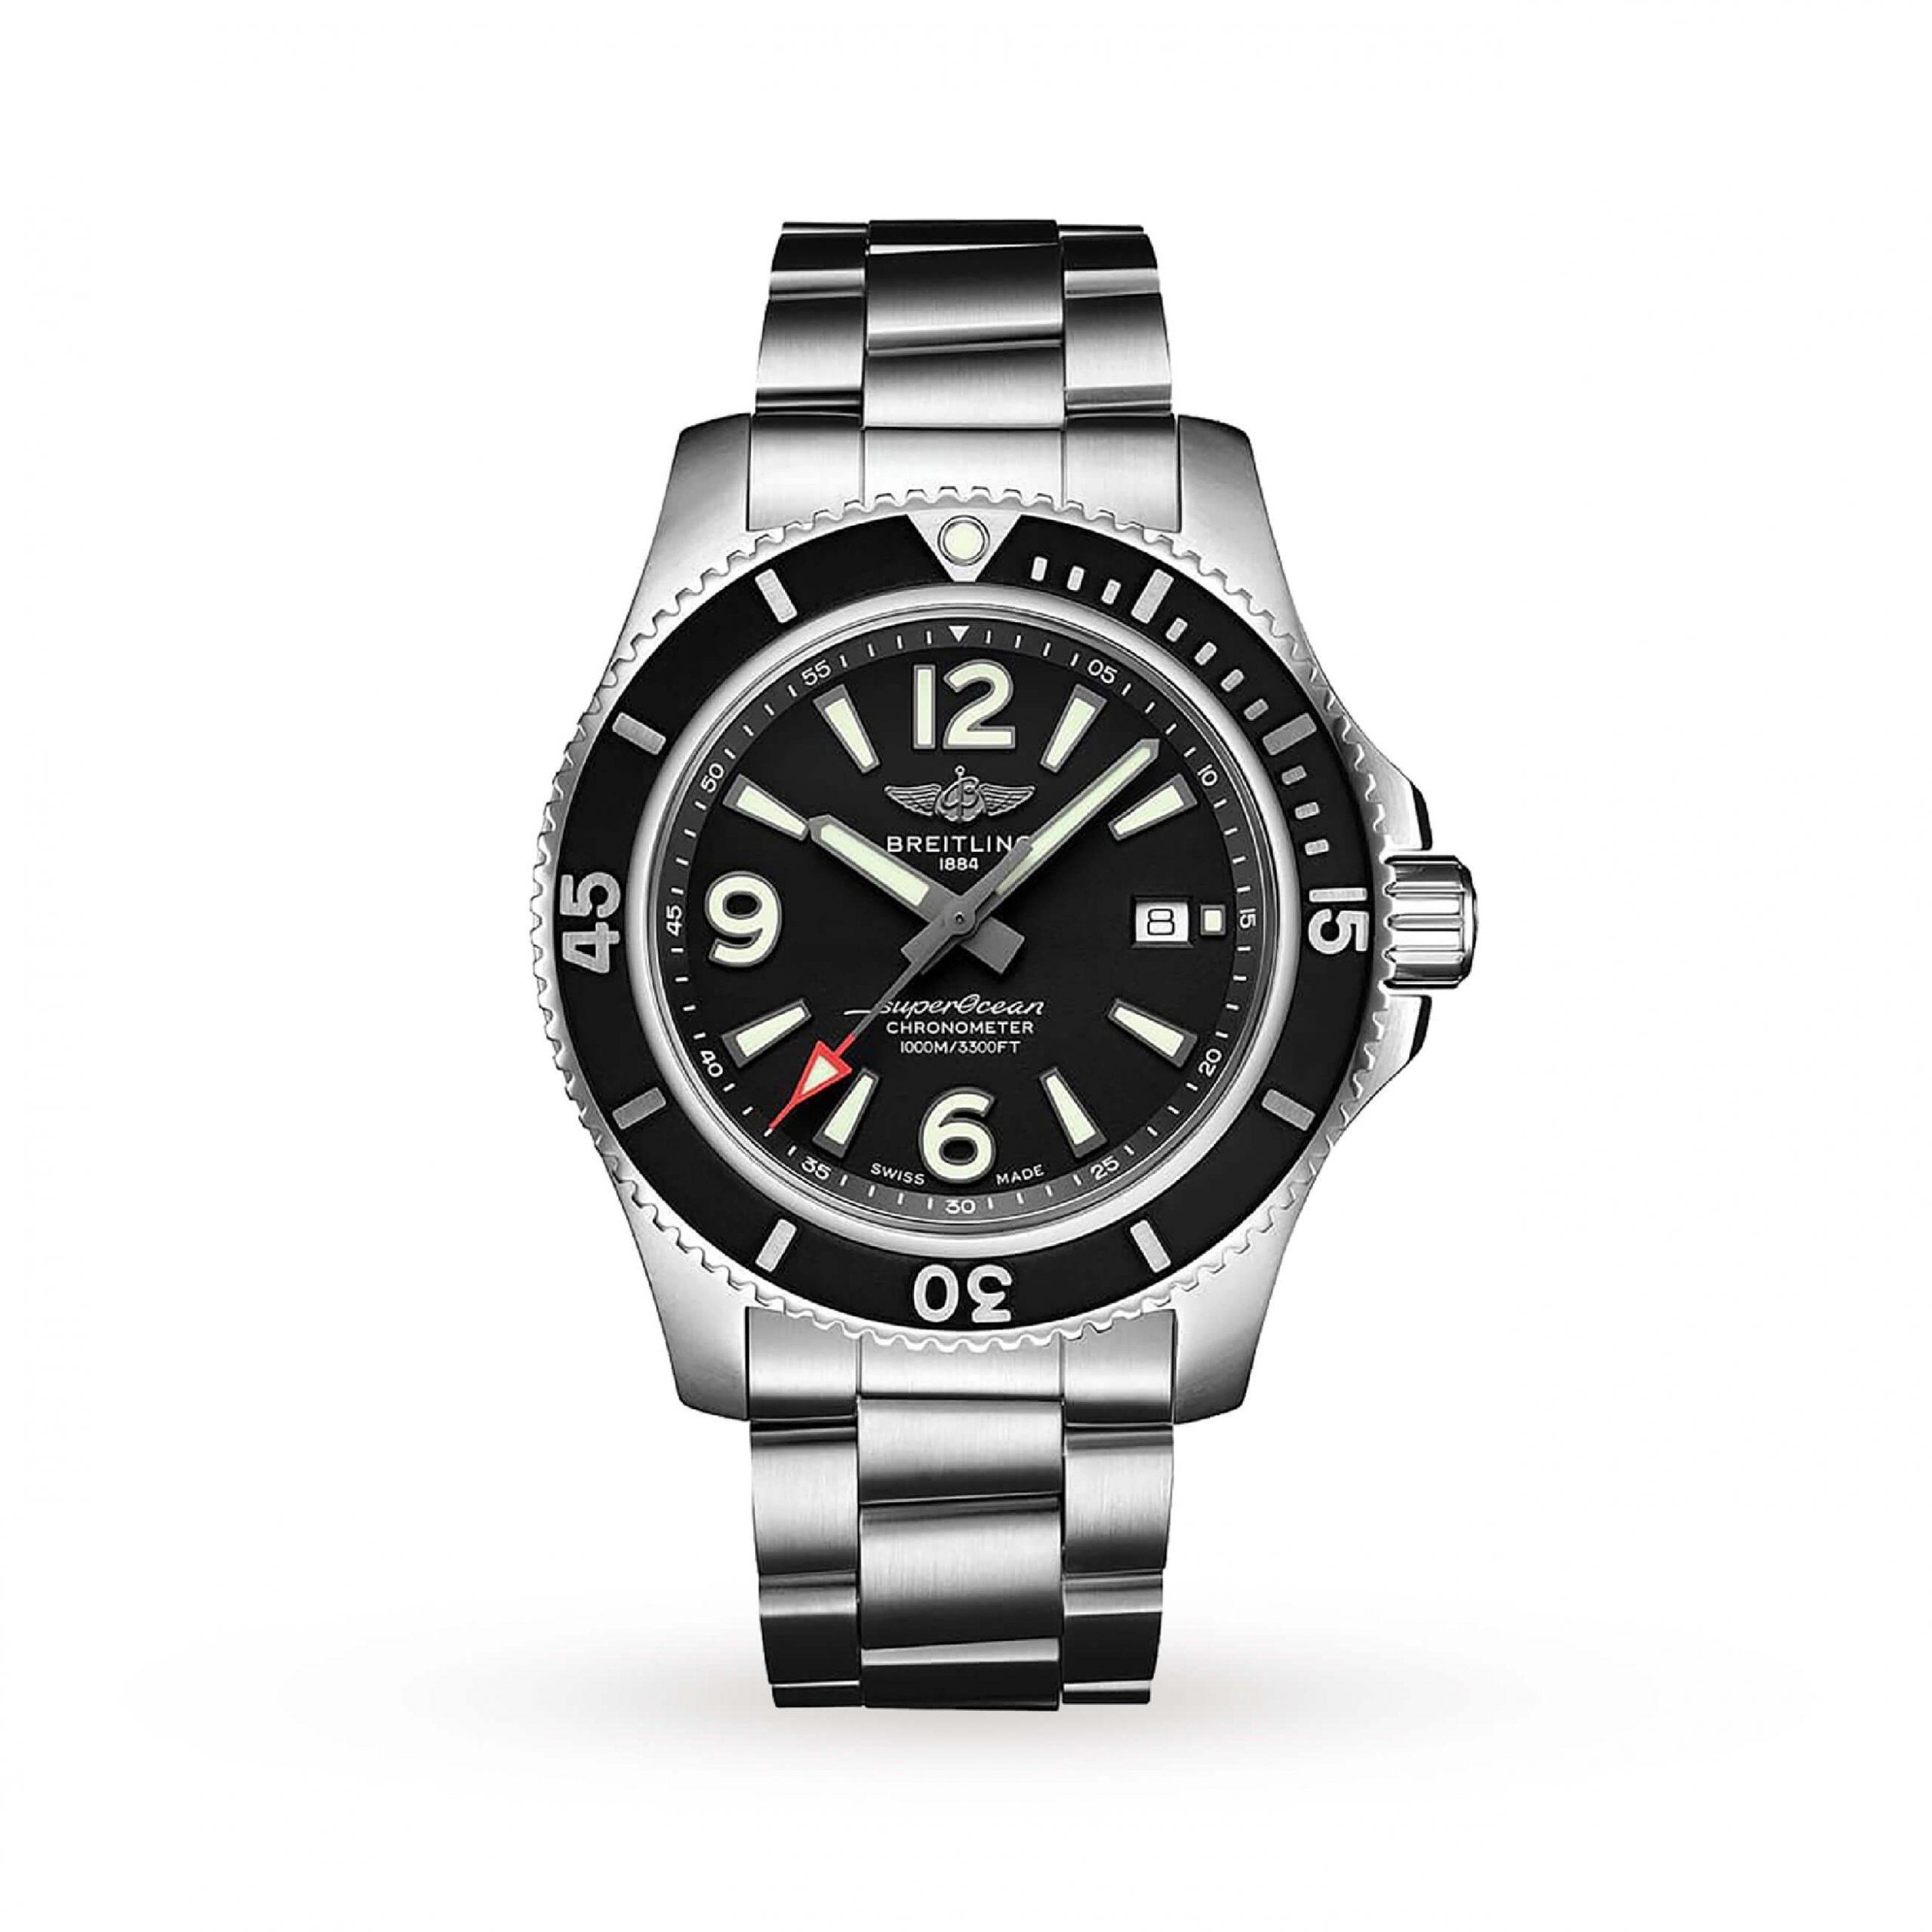 Breitling Superocean | Wristwatches360